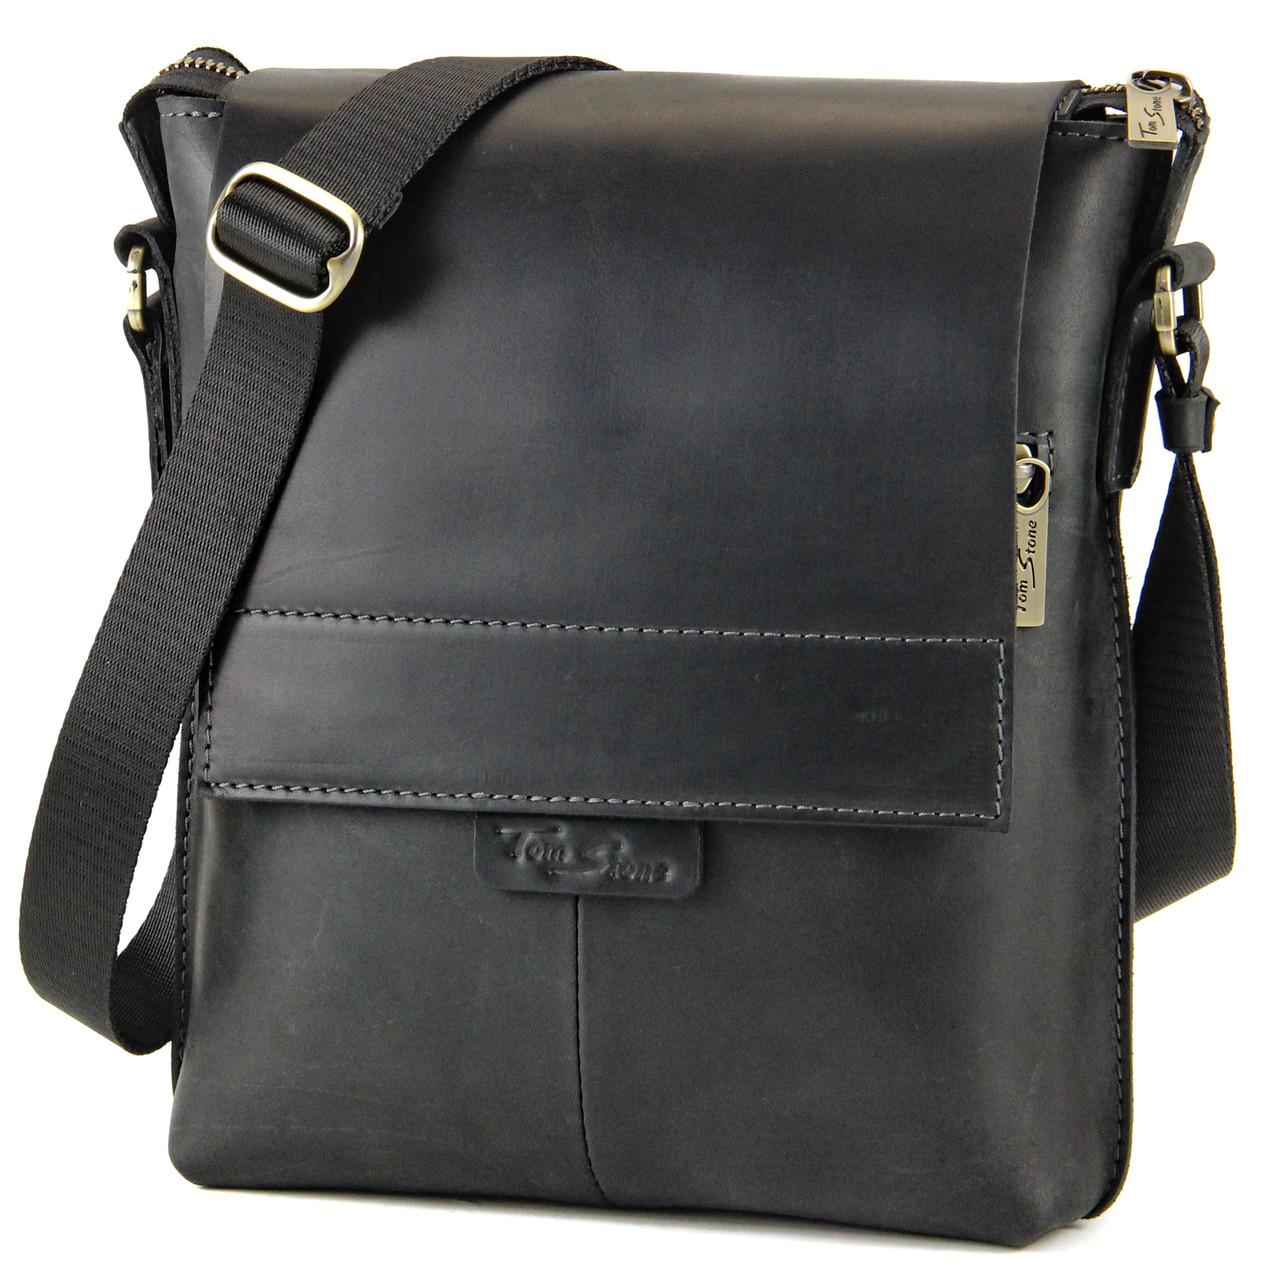 8857dcfc1240 Кожаная мужская сумка Tom Stone через плечо от интернет-магазина ...